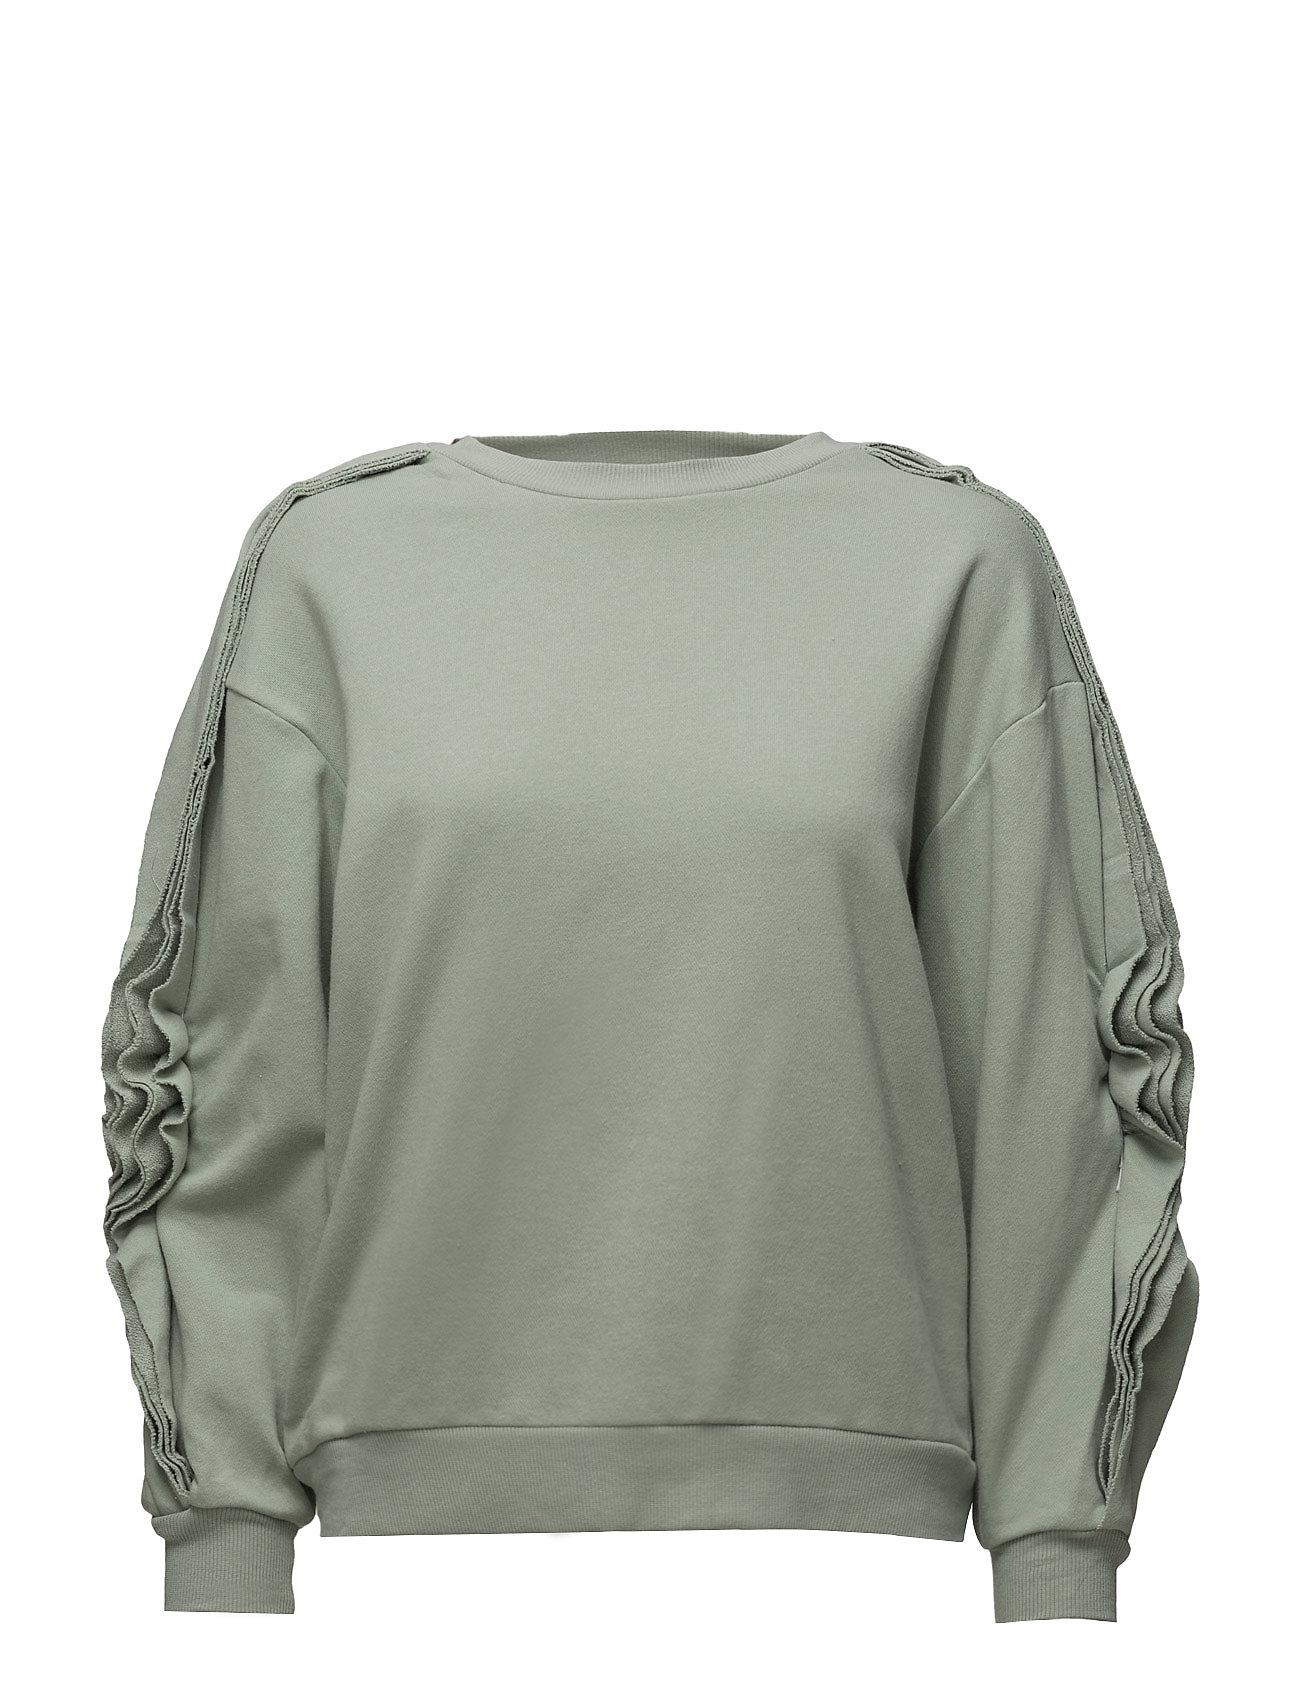 Ruffled Sleeves Sweatshirt Mango  til Damer i Grøn